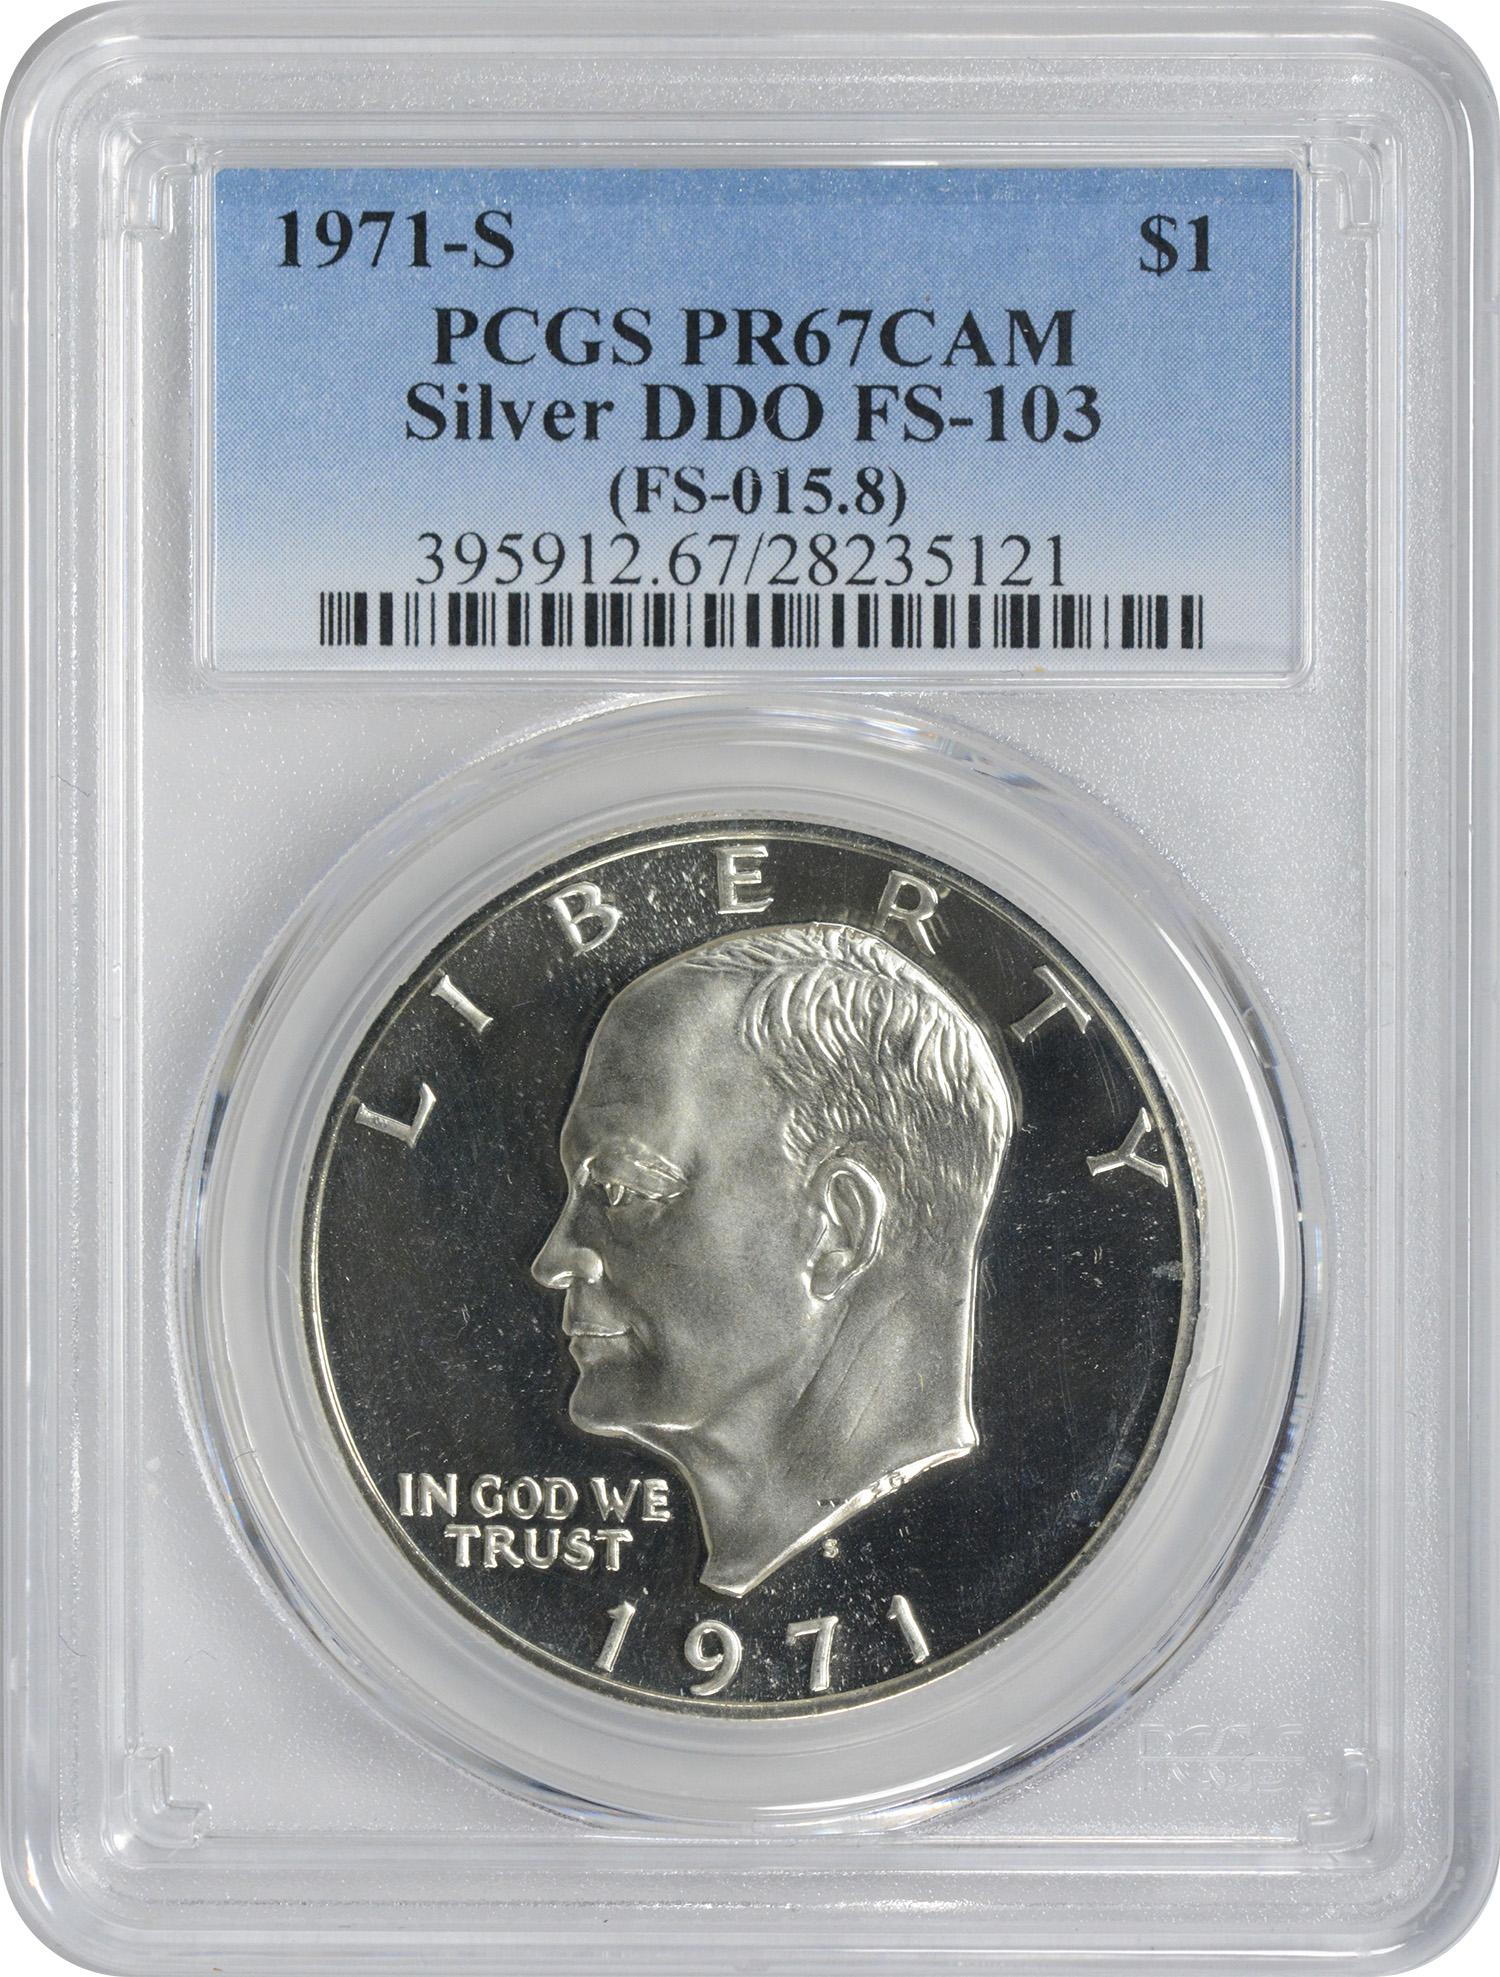 1971-S Eisenhower Silver Dollar, DDO FS-103, PR67CAM, PCGS